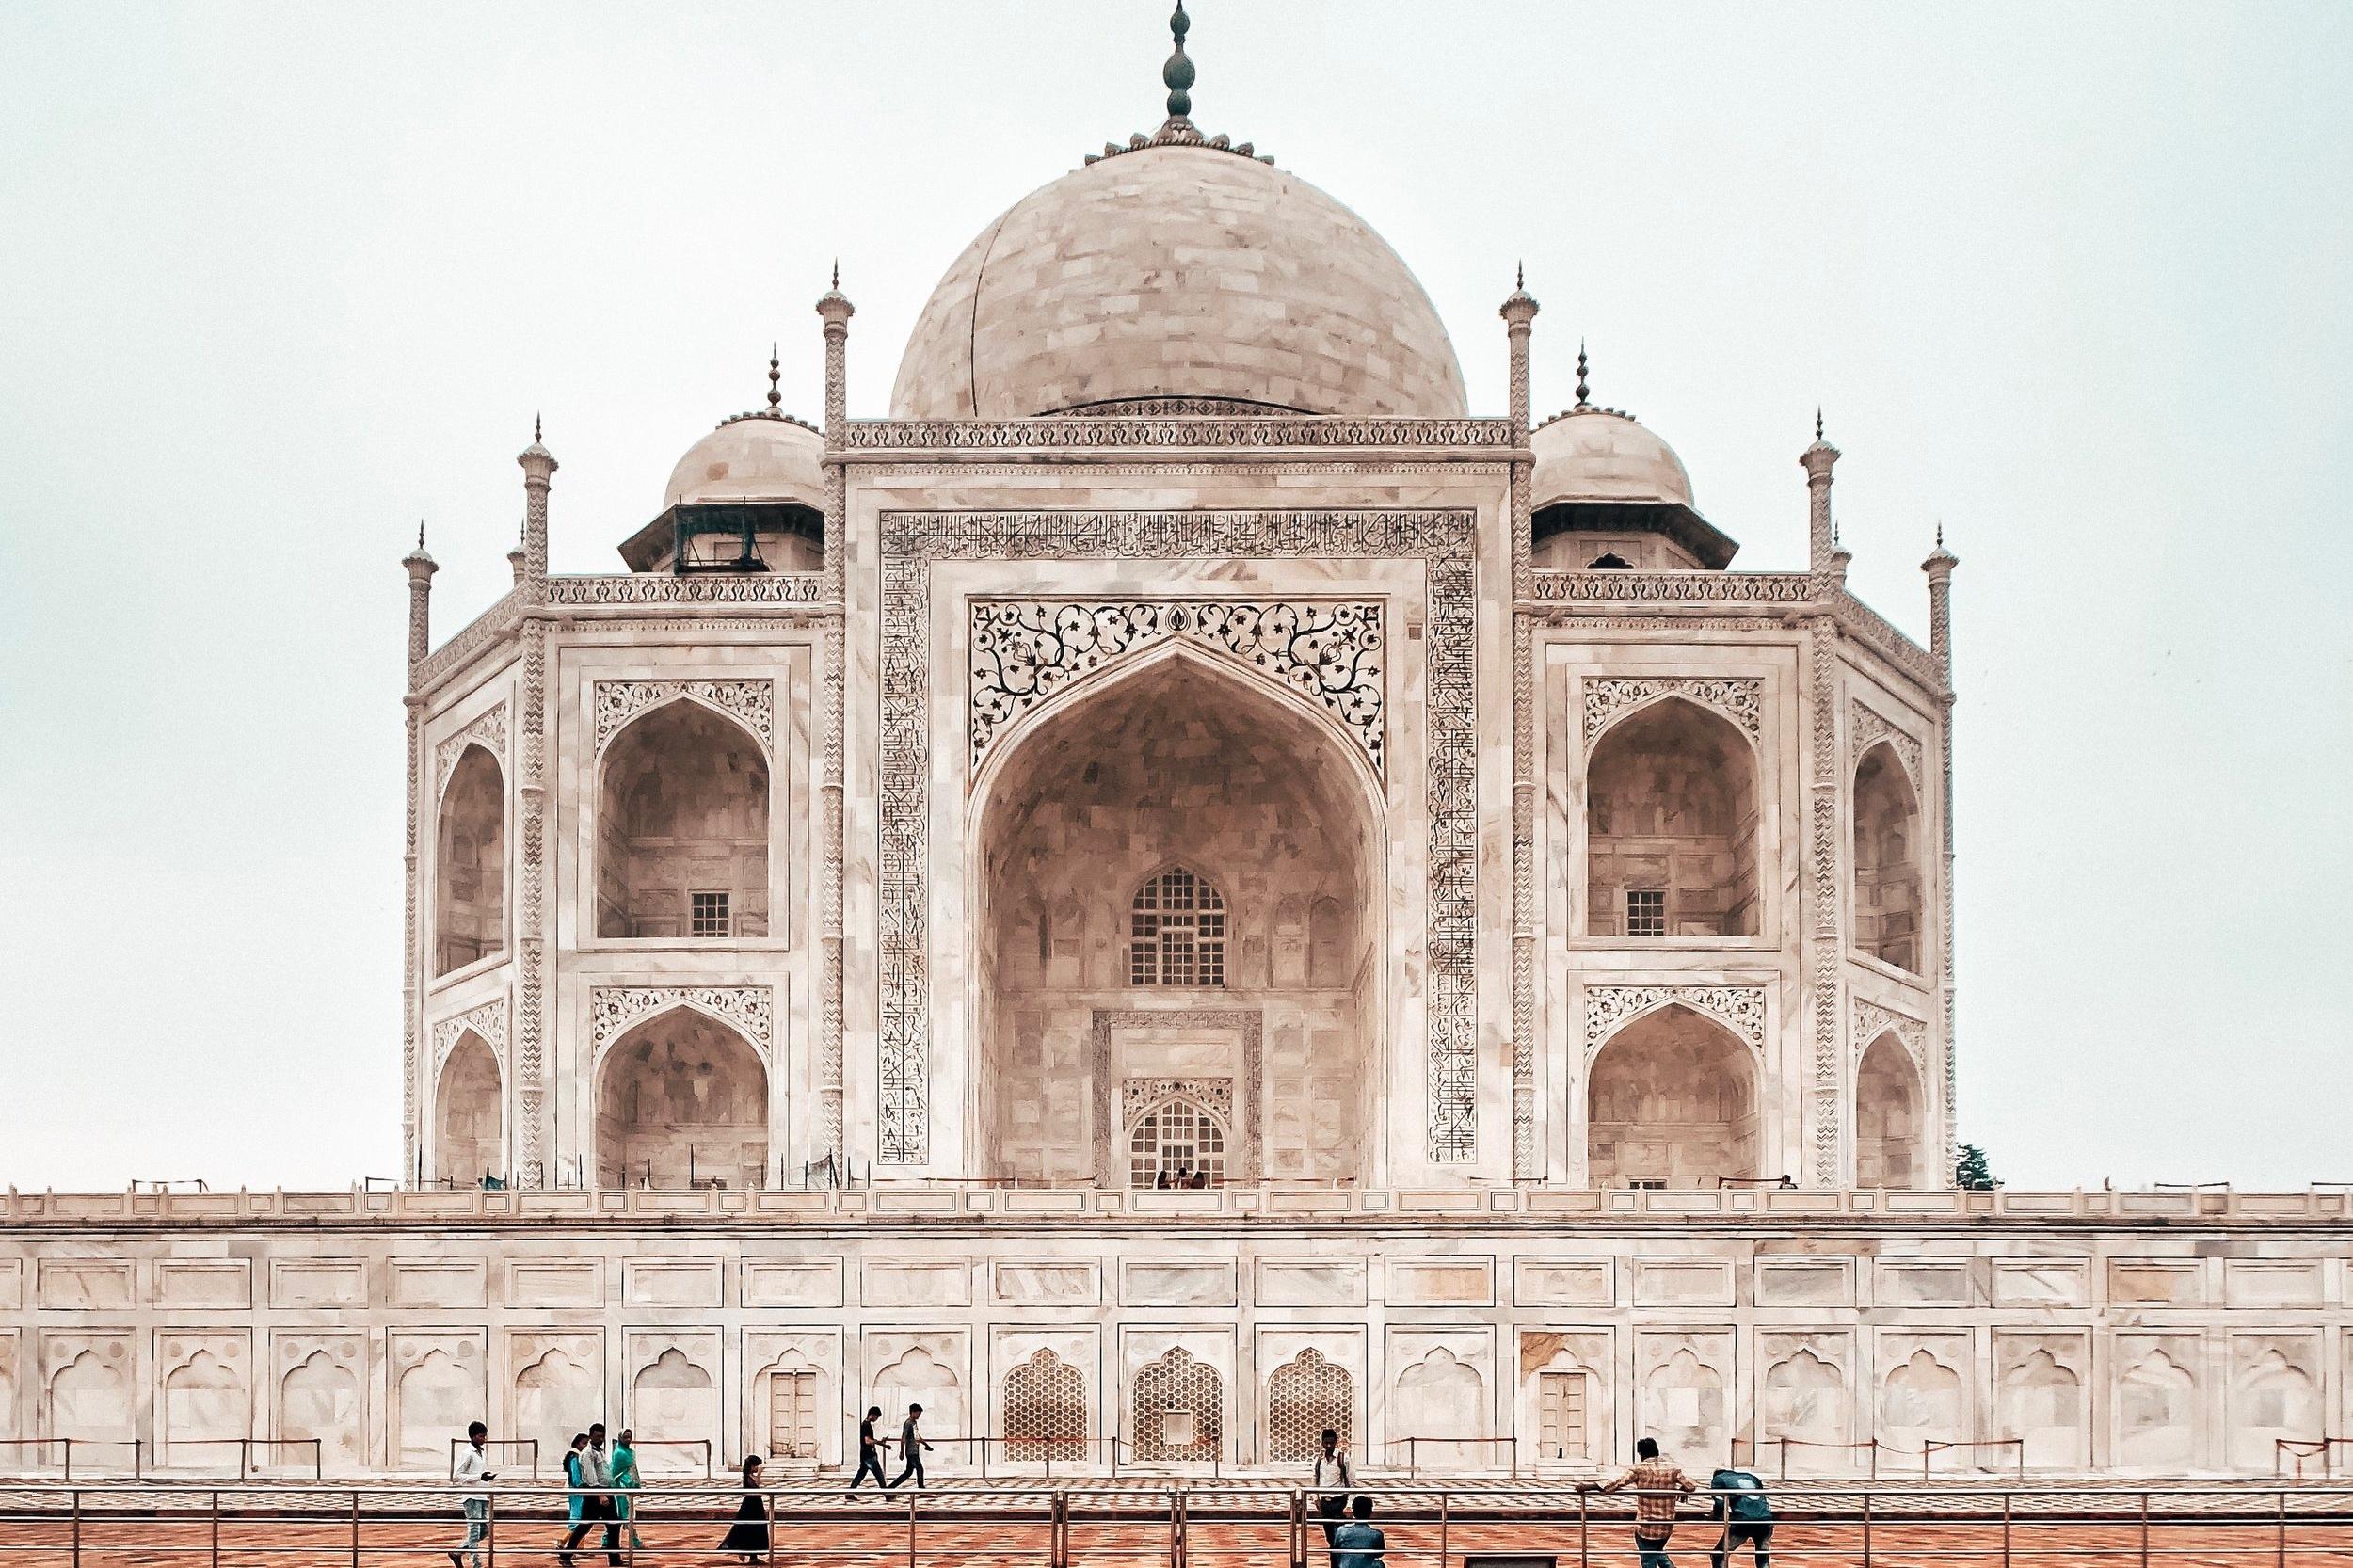 INDIA - Golden Triangle Design Tour